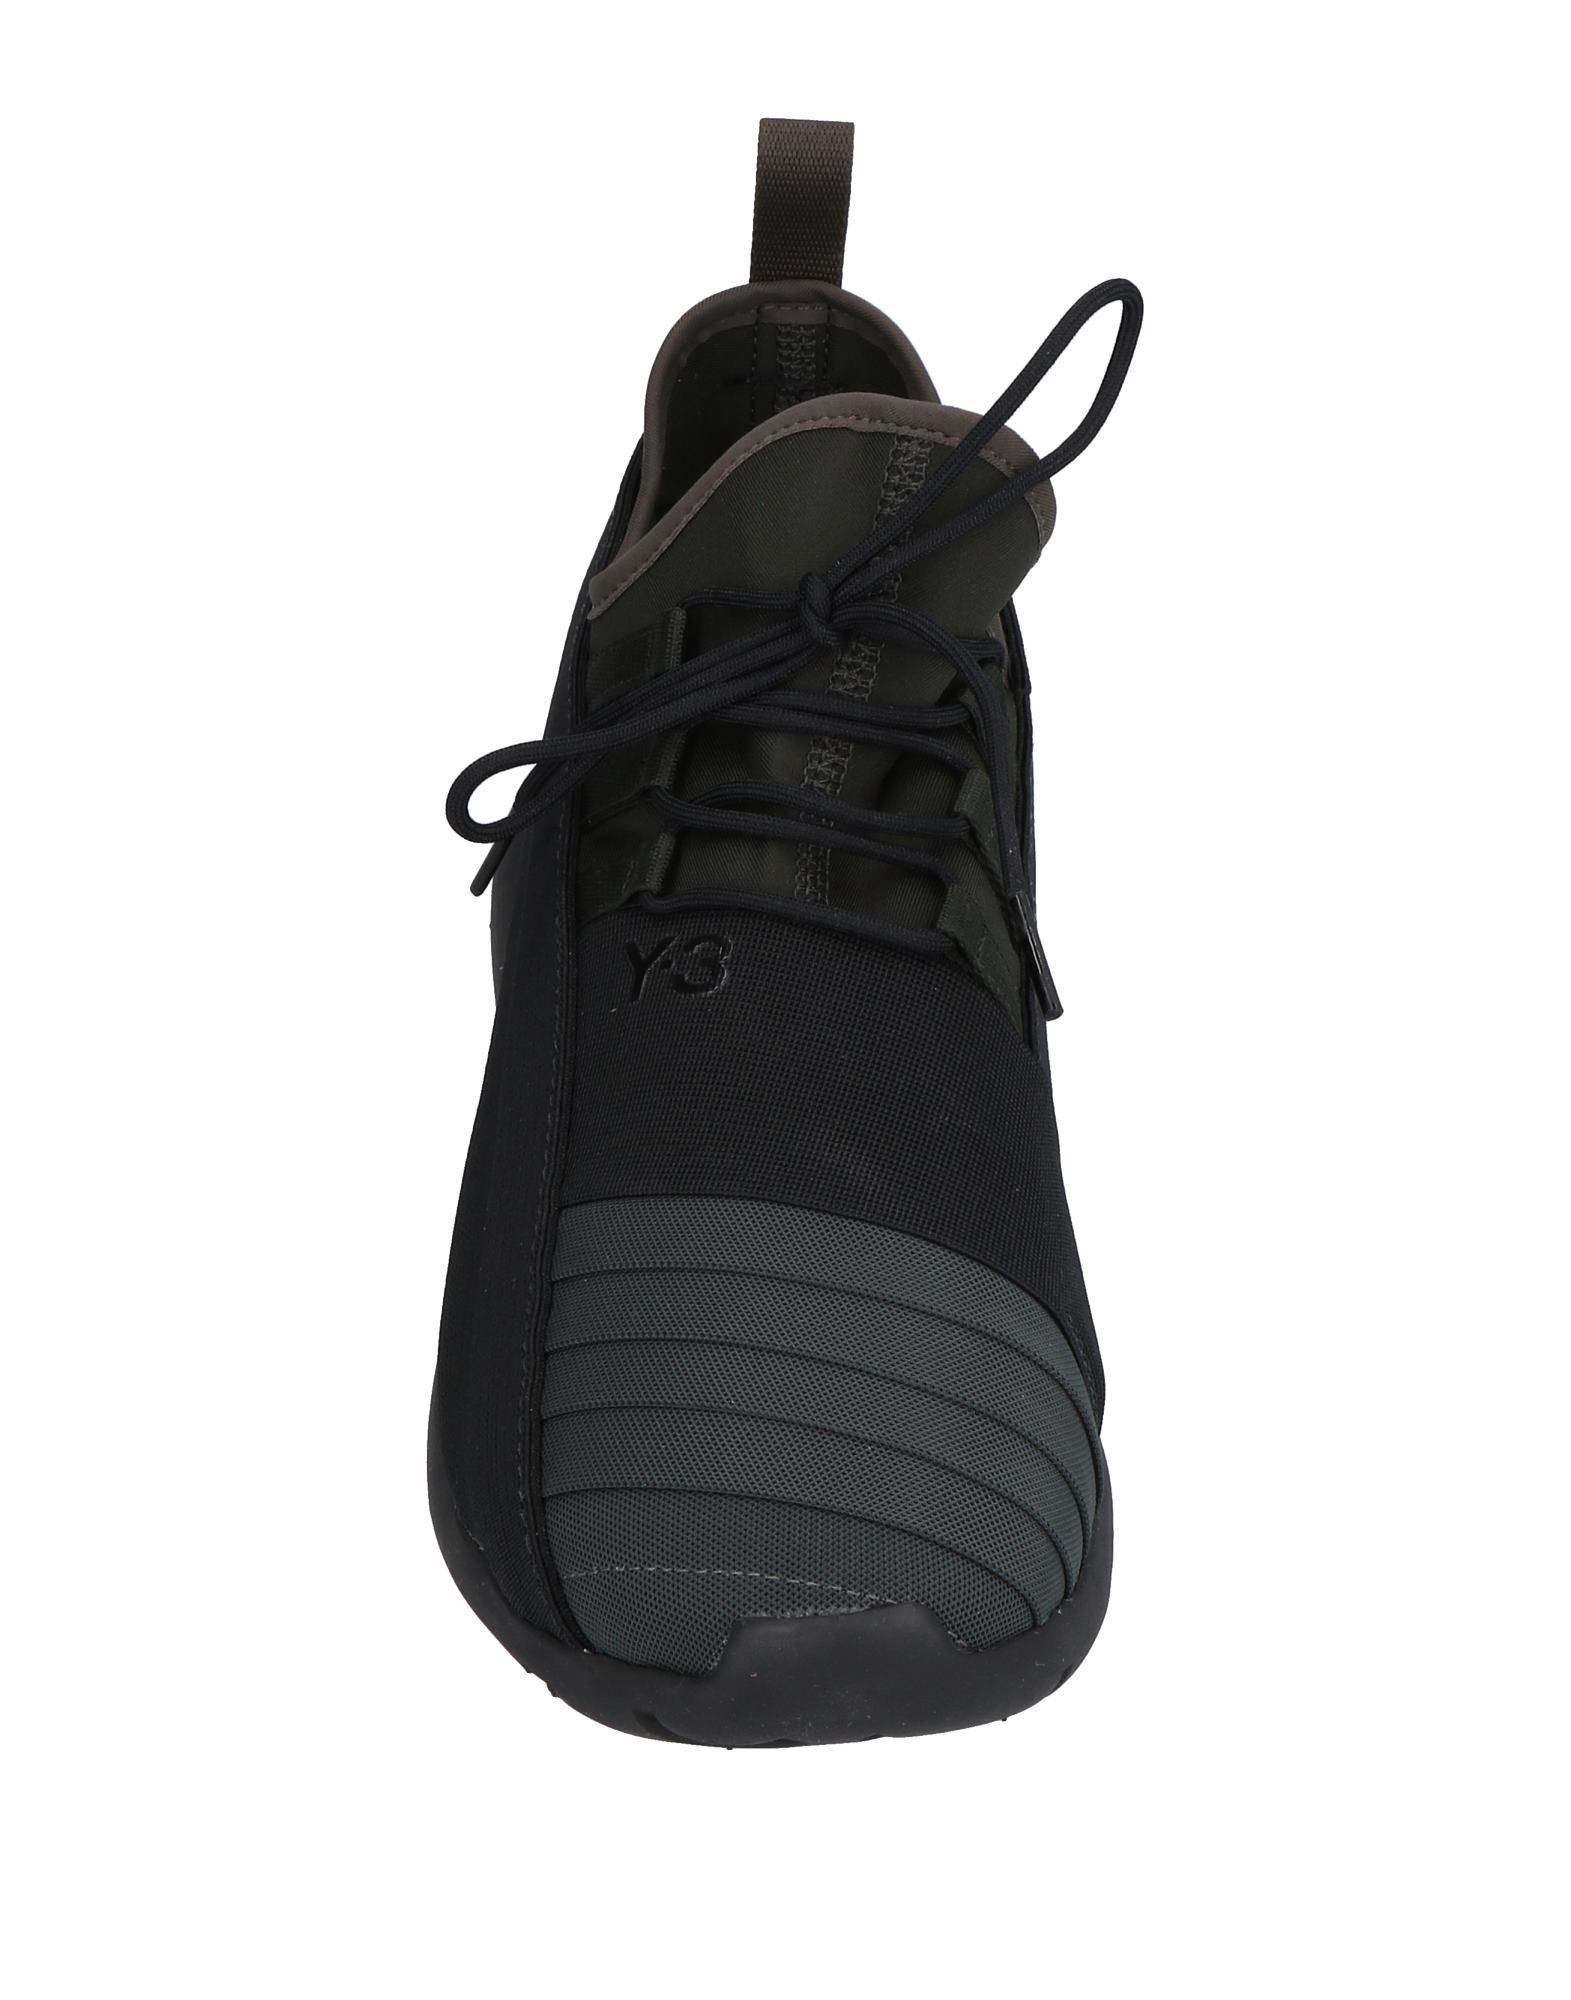 Haltbare Mode billige Schuhe Schuhe Y 11474575ON Beliebte Schuhe billige a72d08